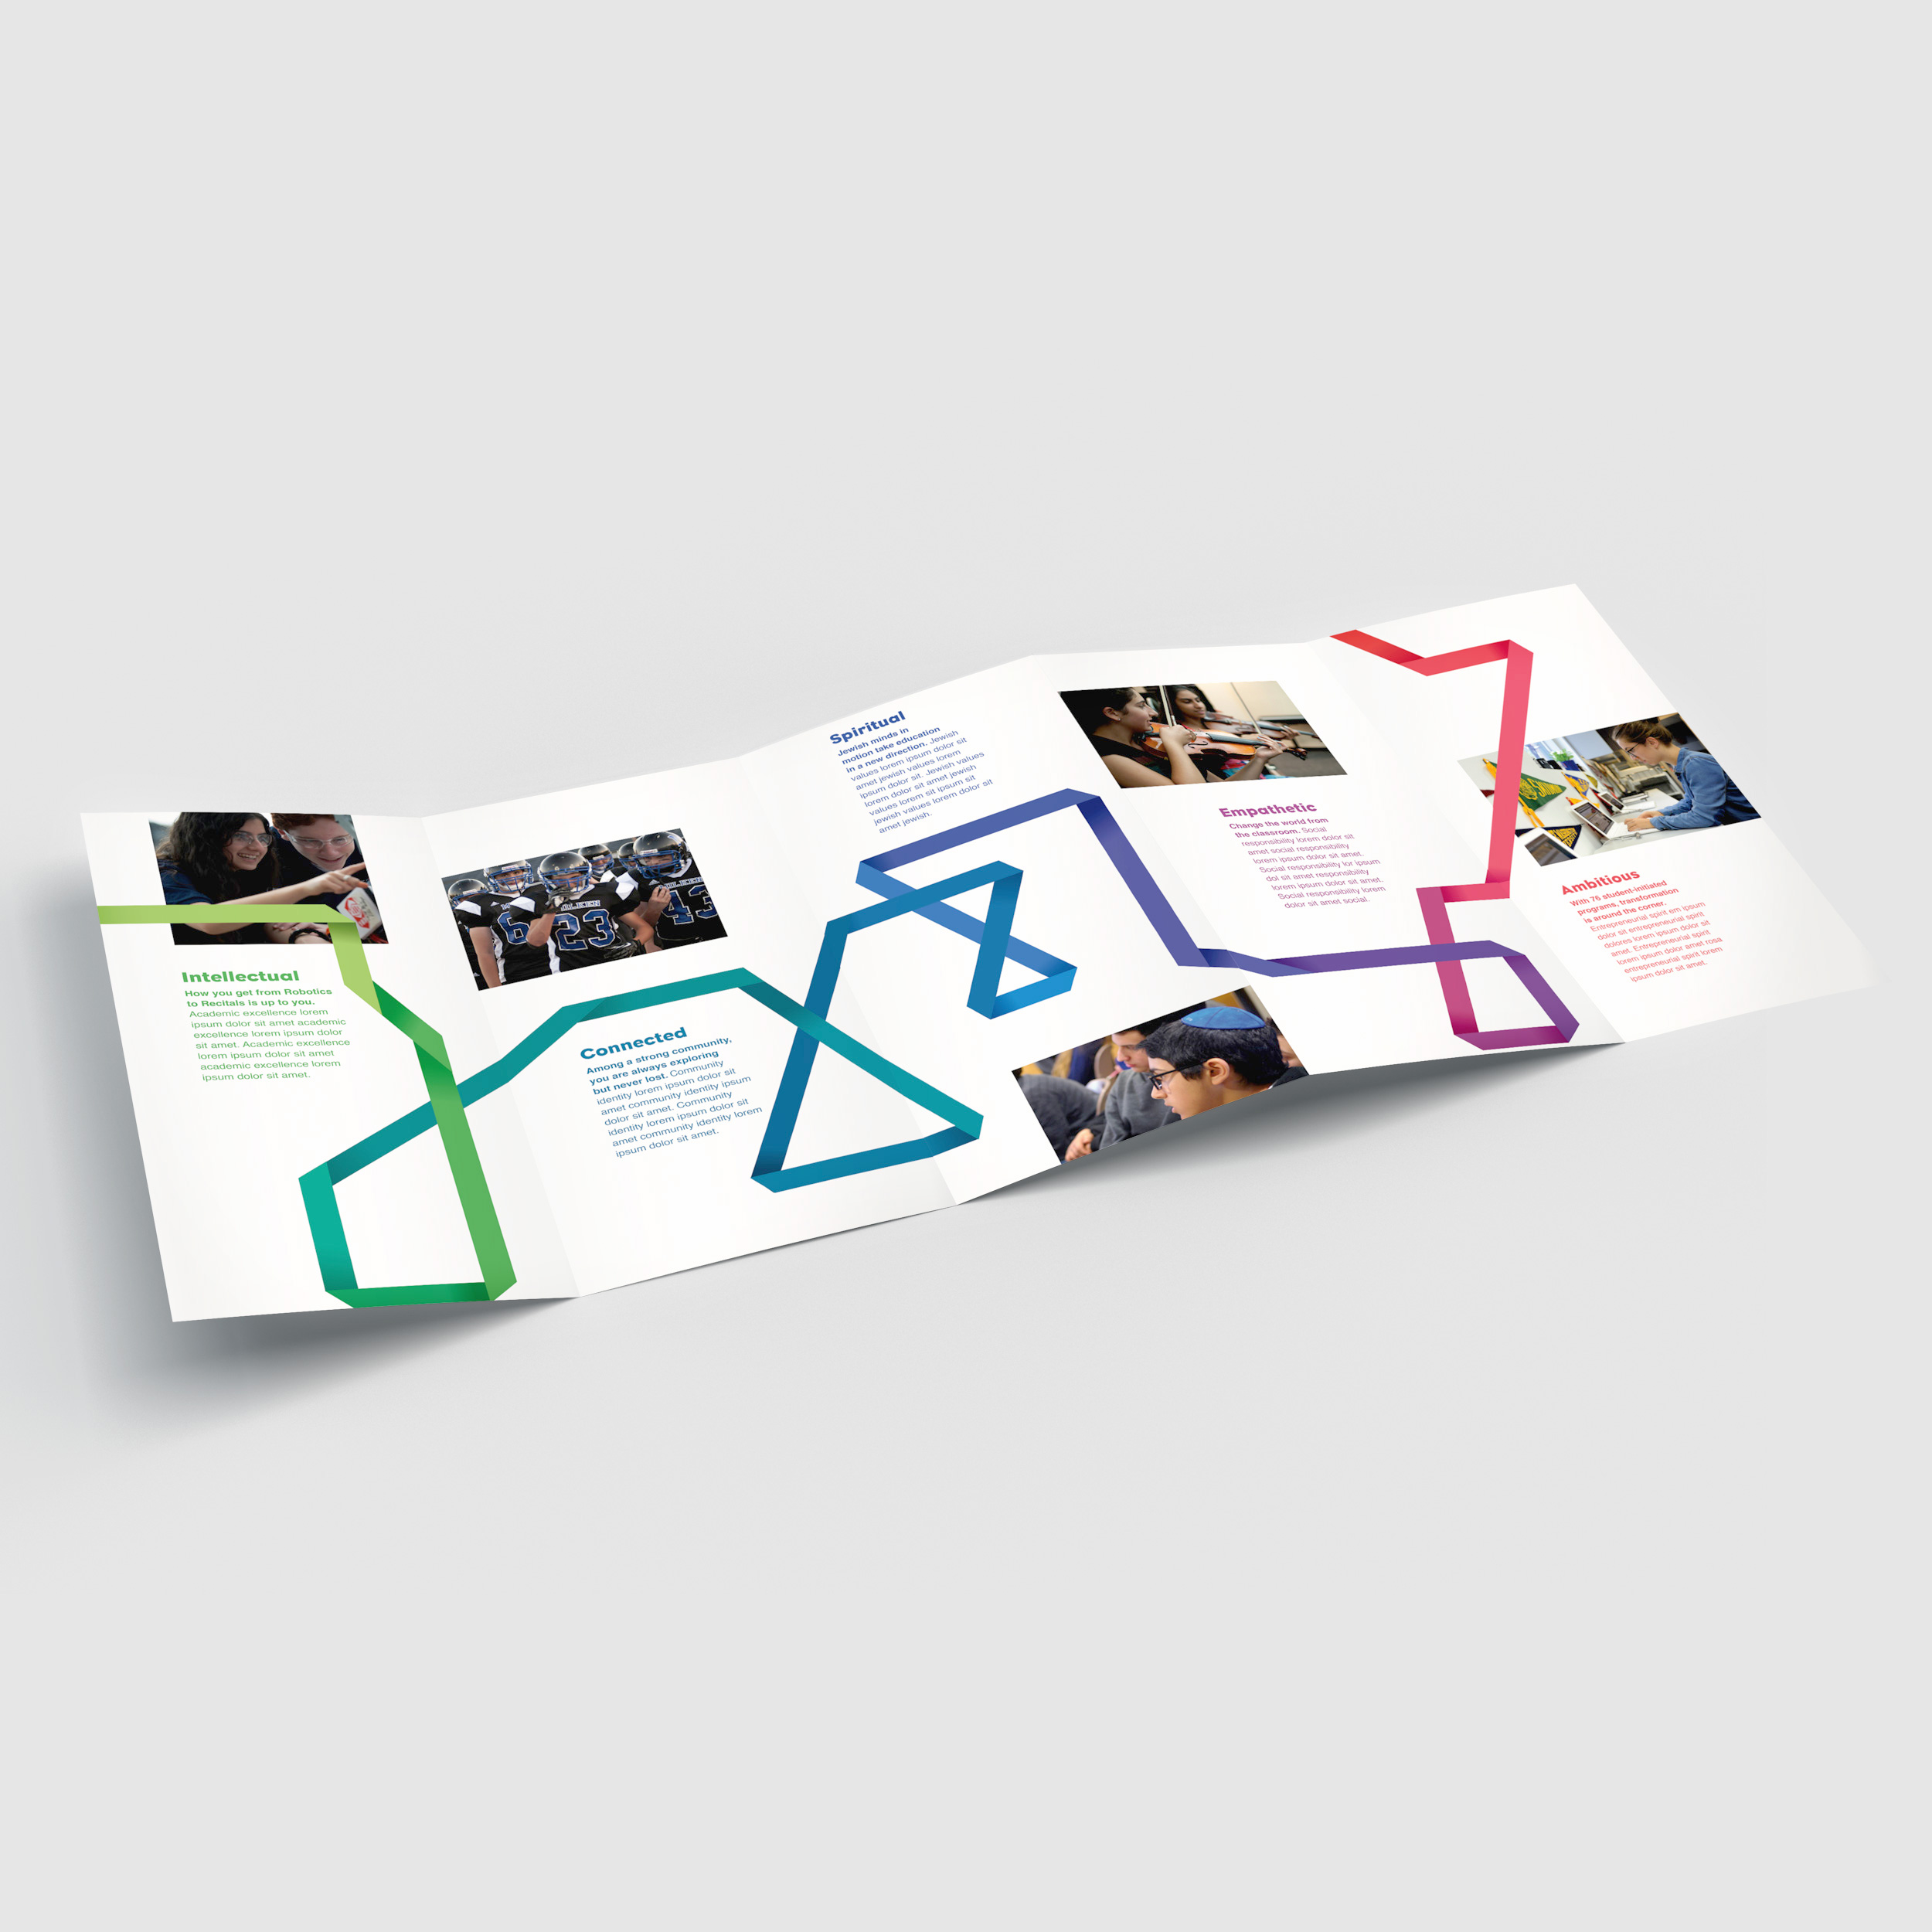 distinc_Milken_brochure_accordion.jpg